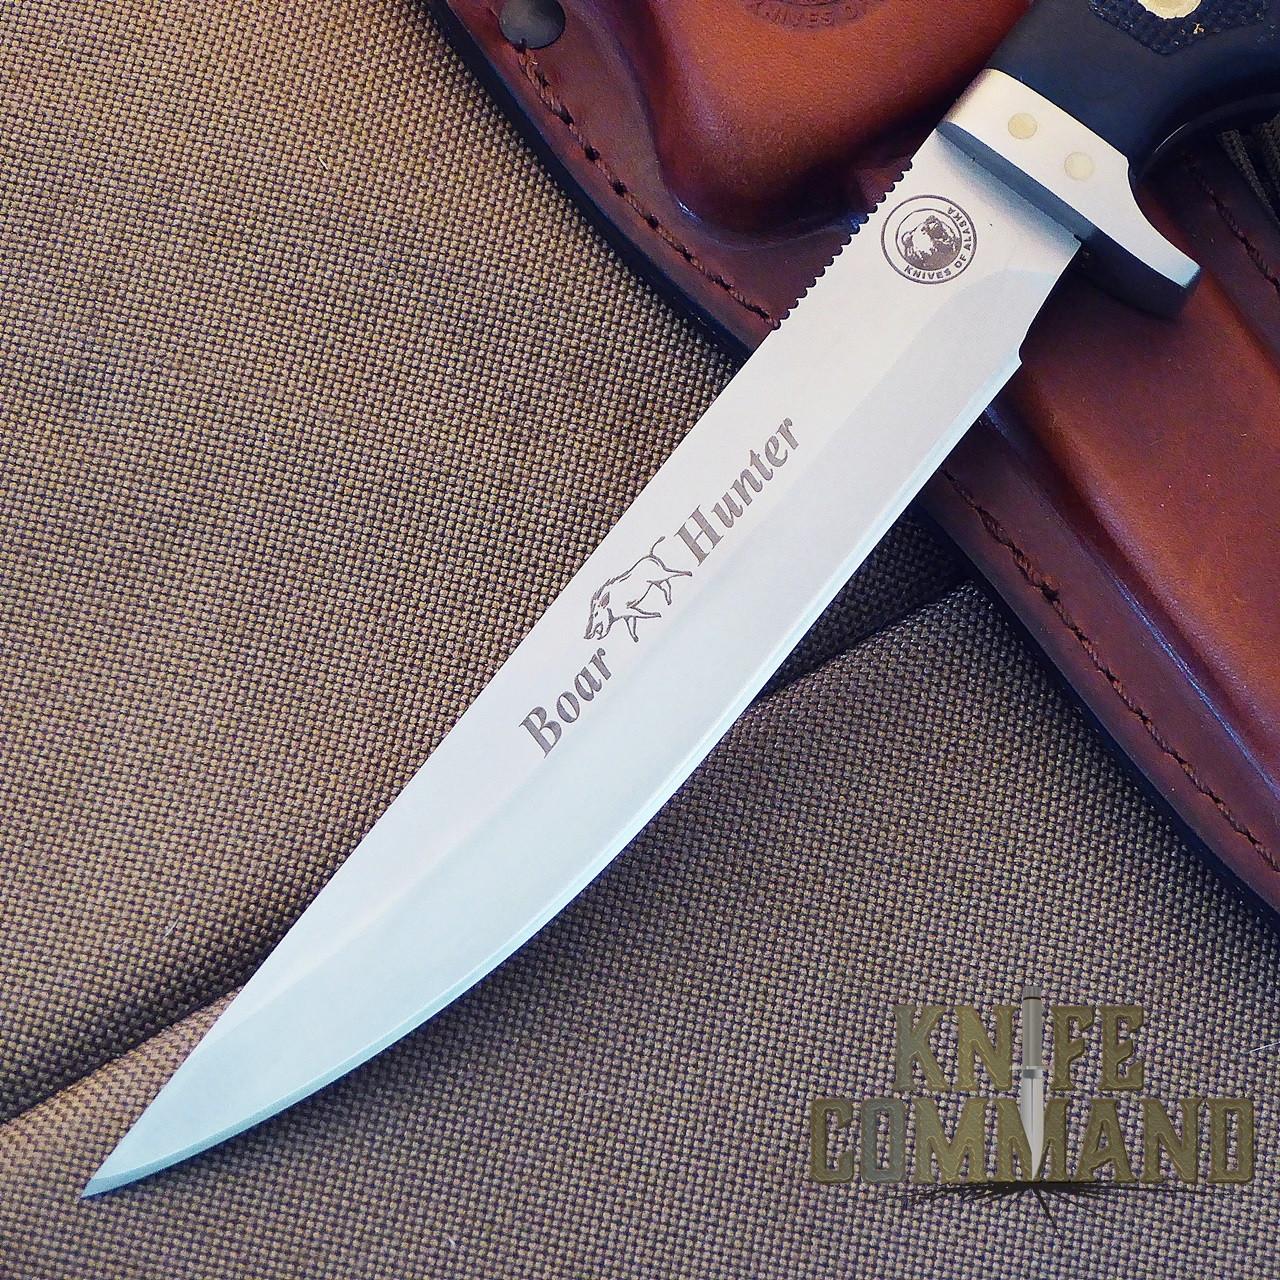 Knives of Alaska Boar Hunter Hunting Knife.  Straight spine for excellent penetration.